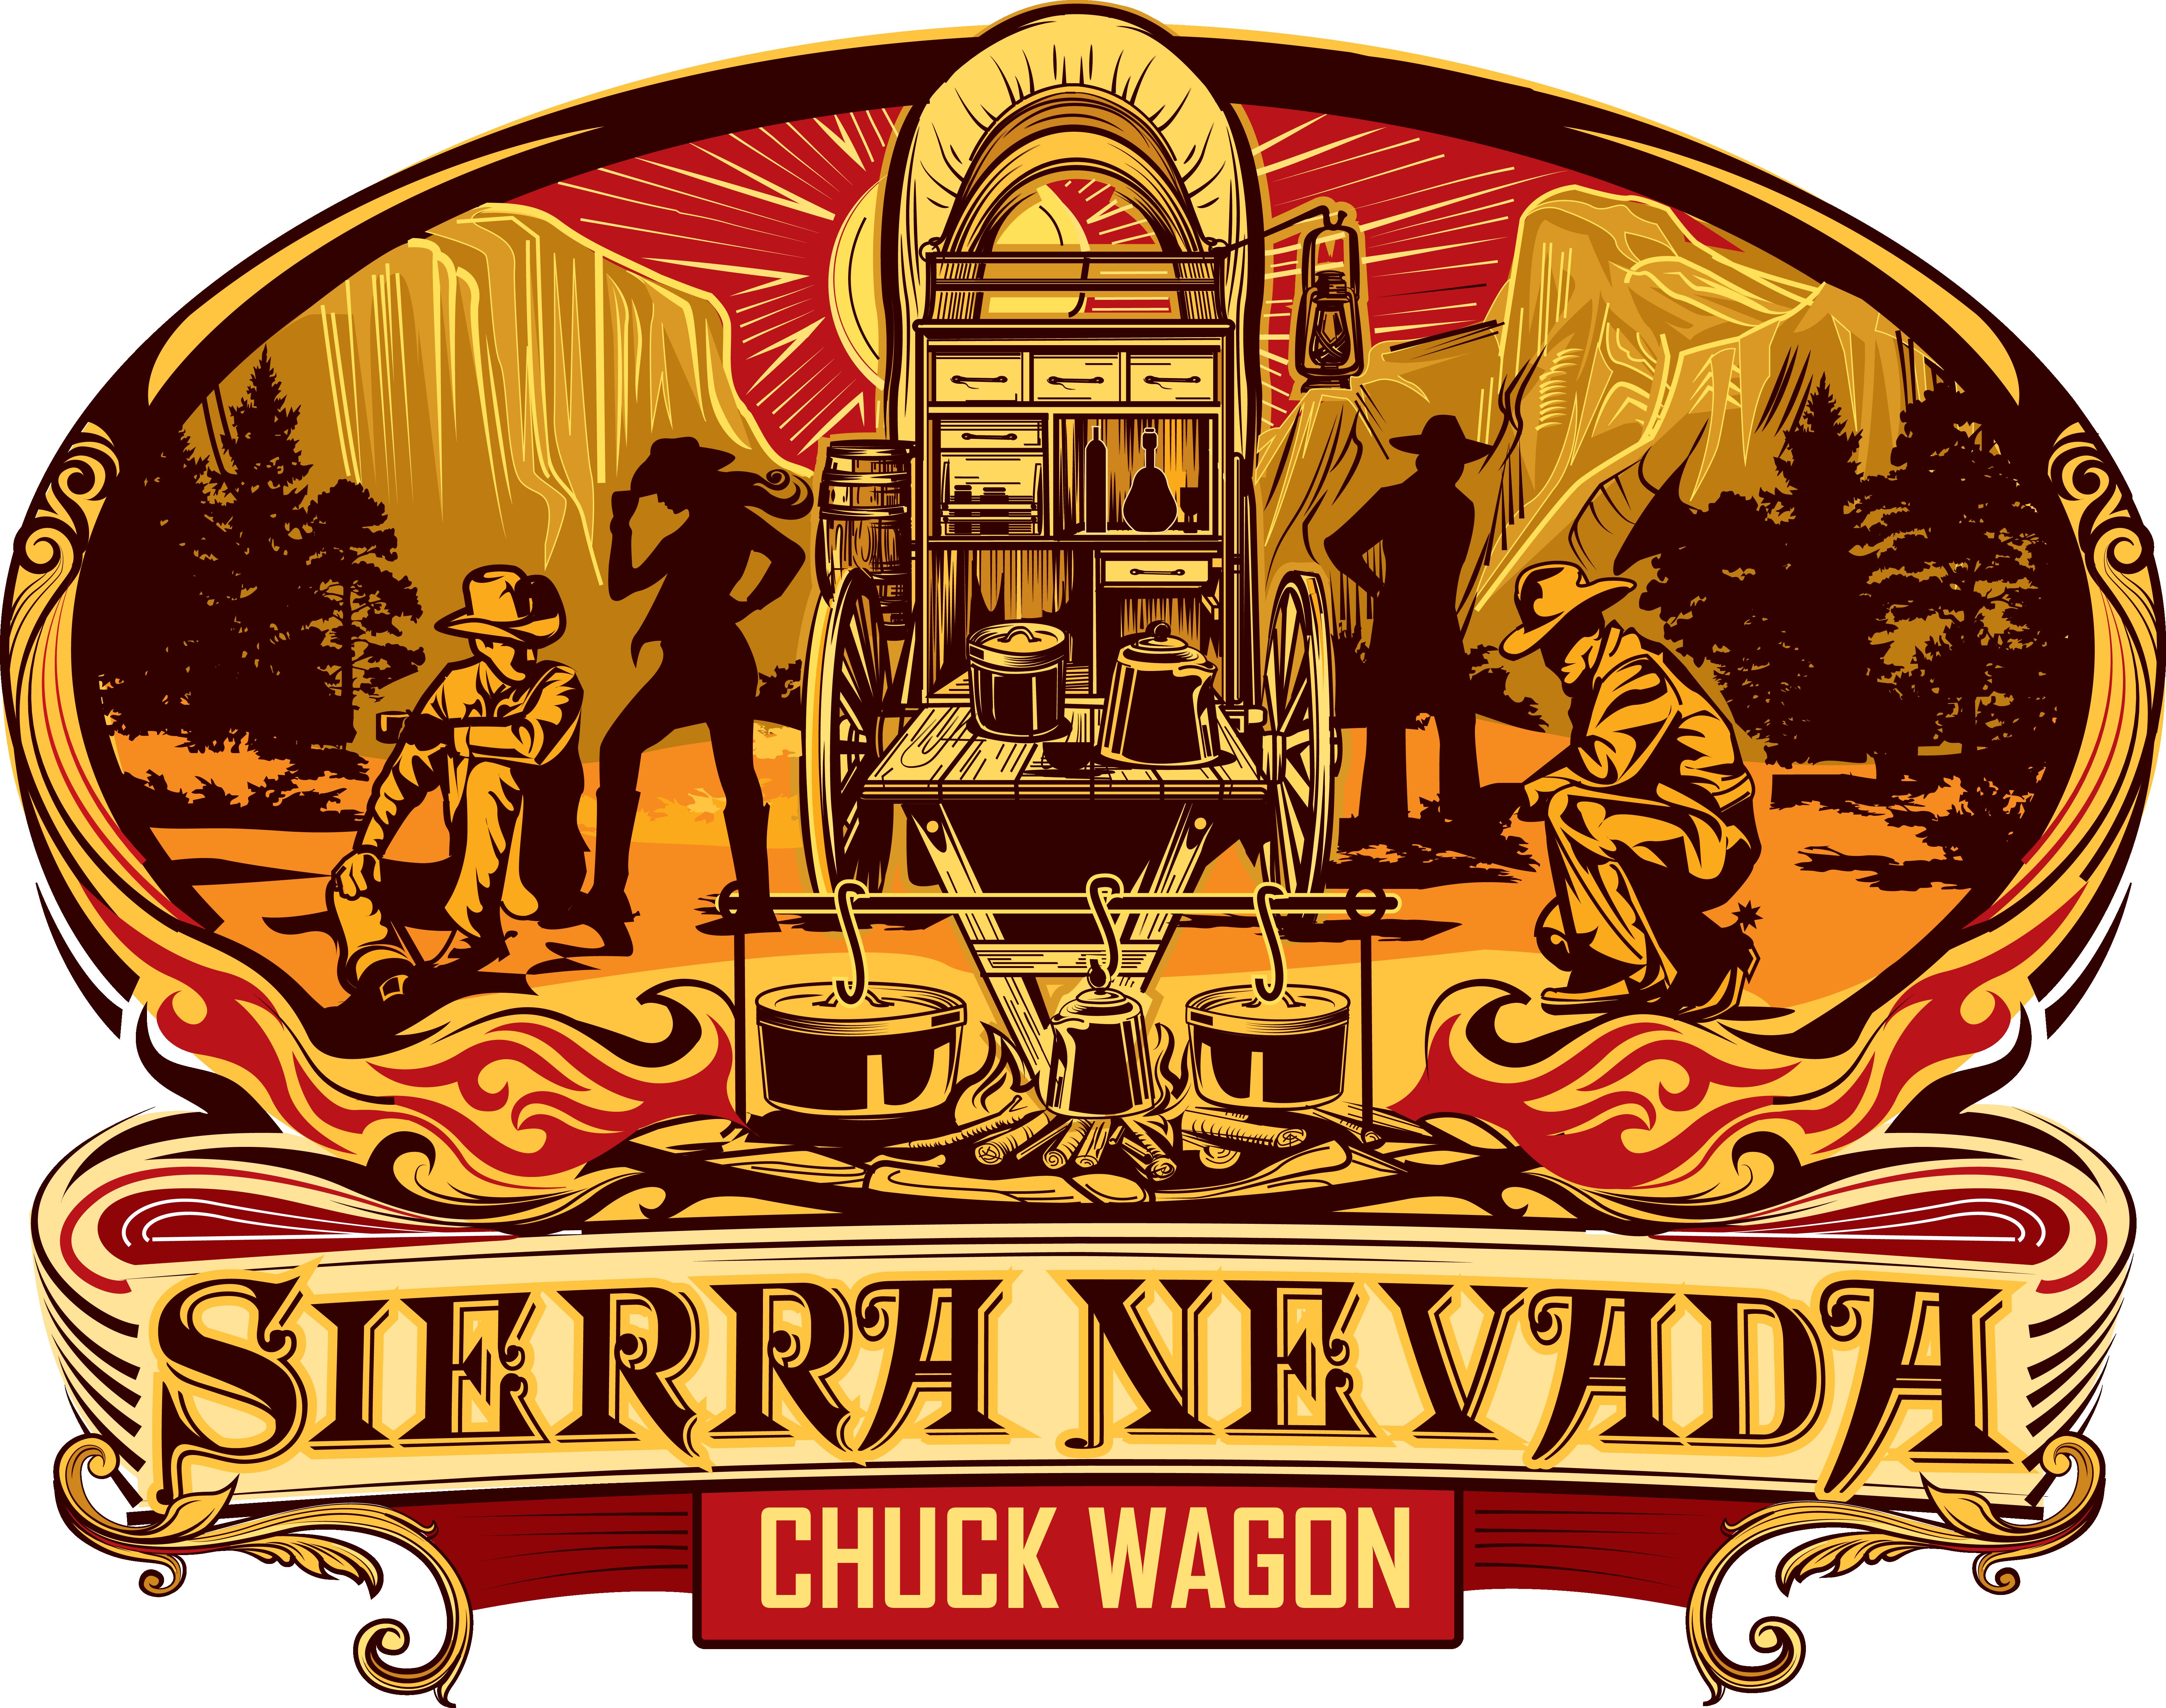 Design a bold and striking logo for Sierra Nevada Chuck Wagon